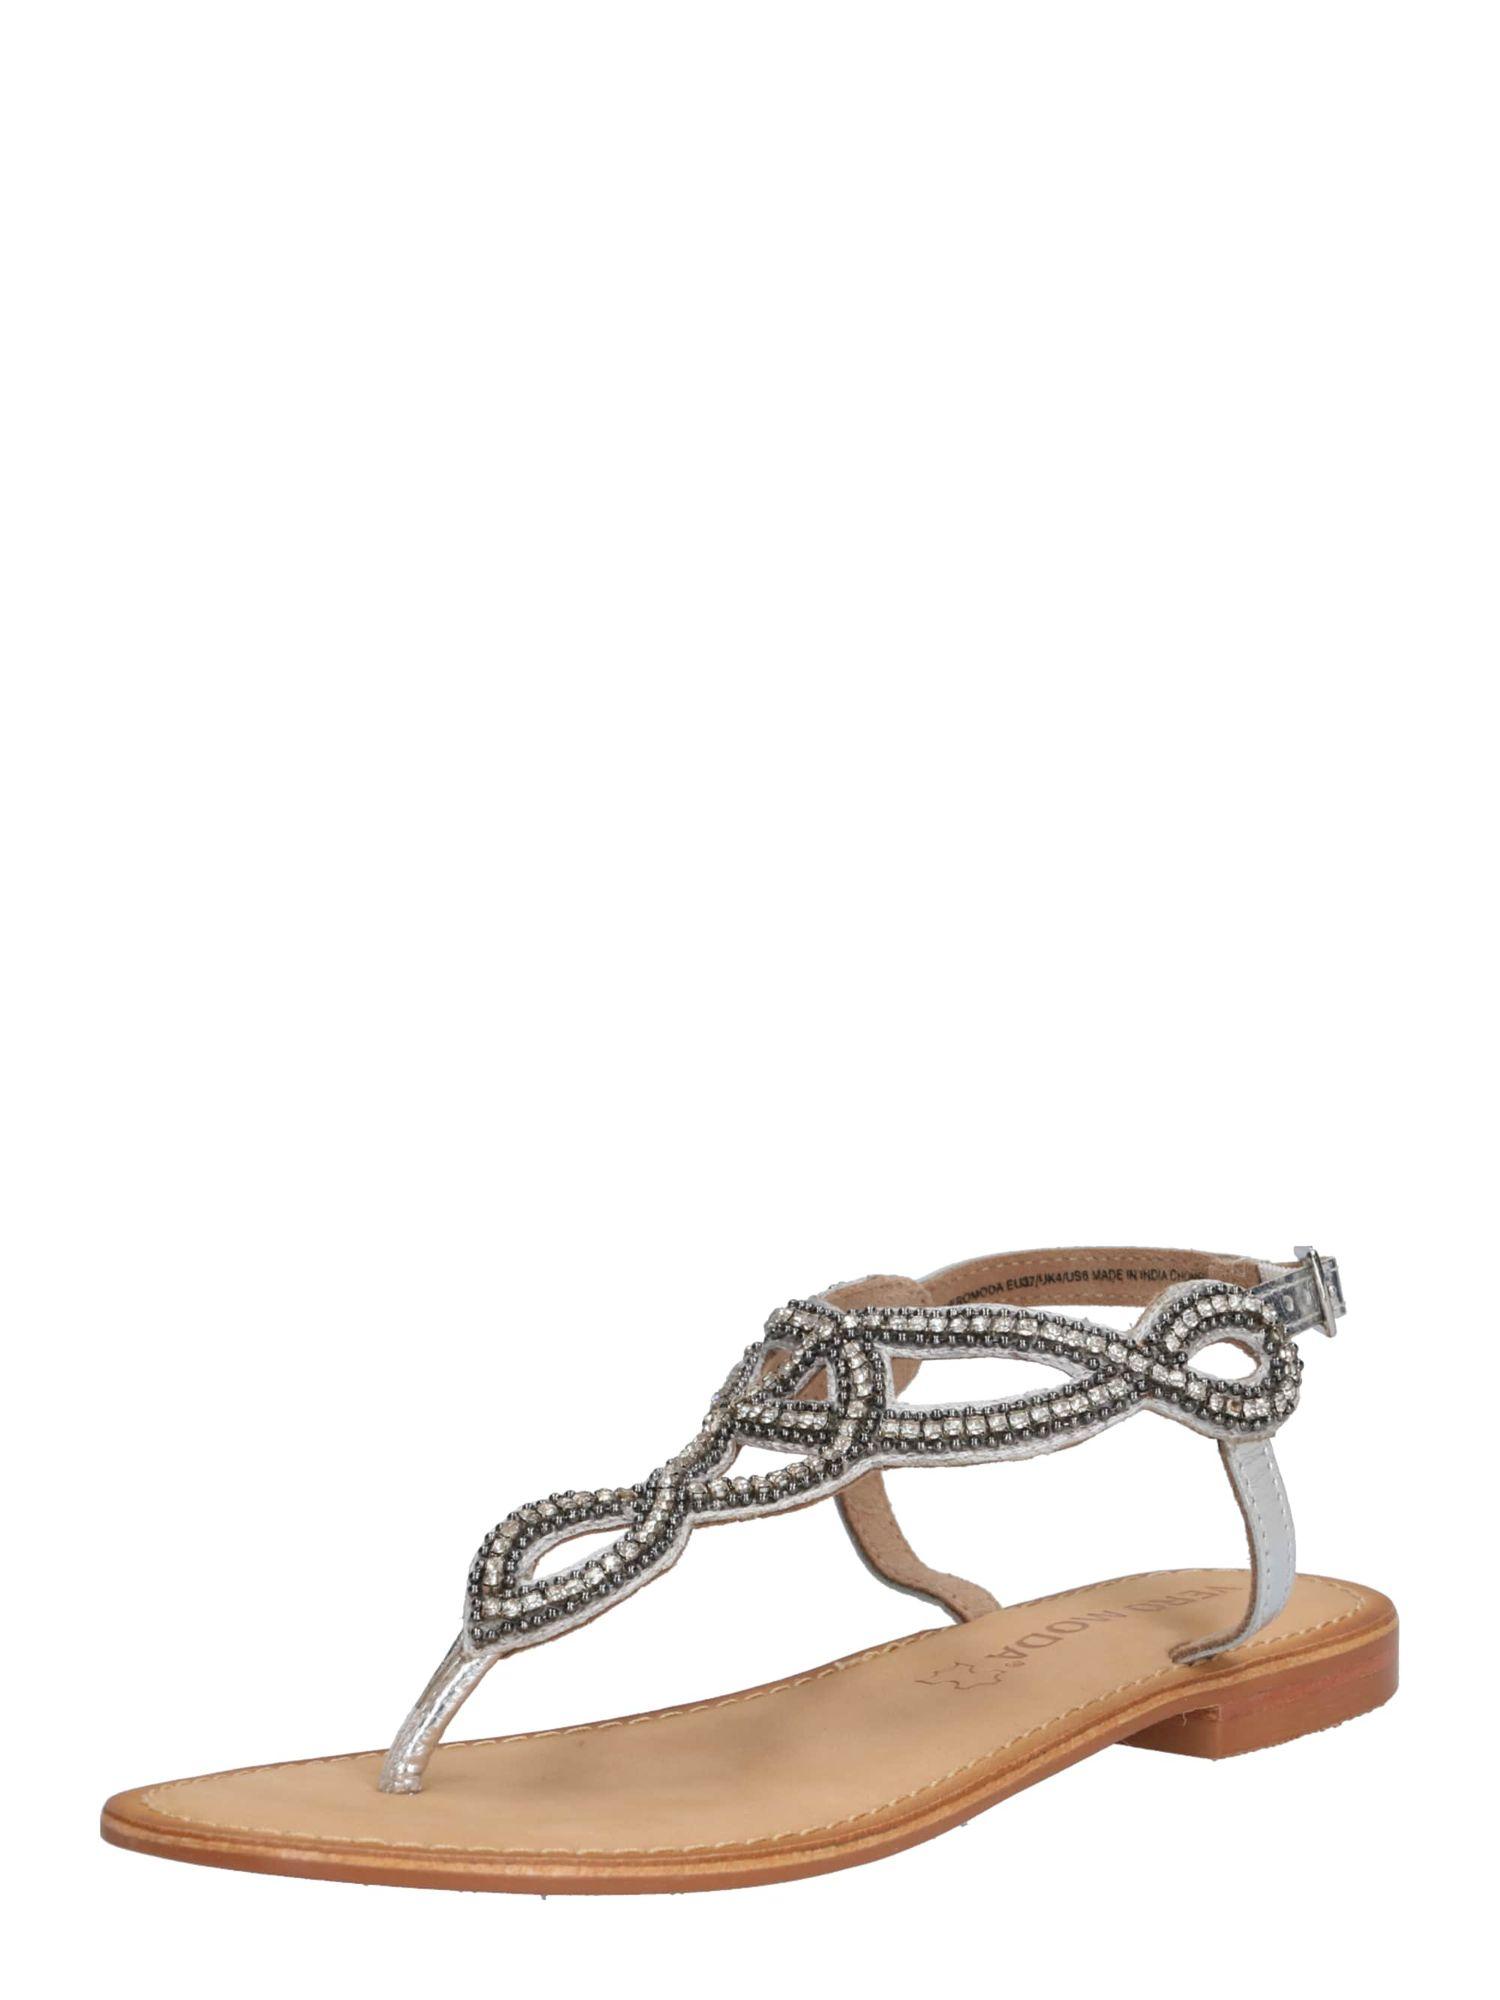 Sandale ´LIV´